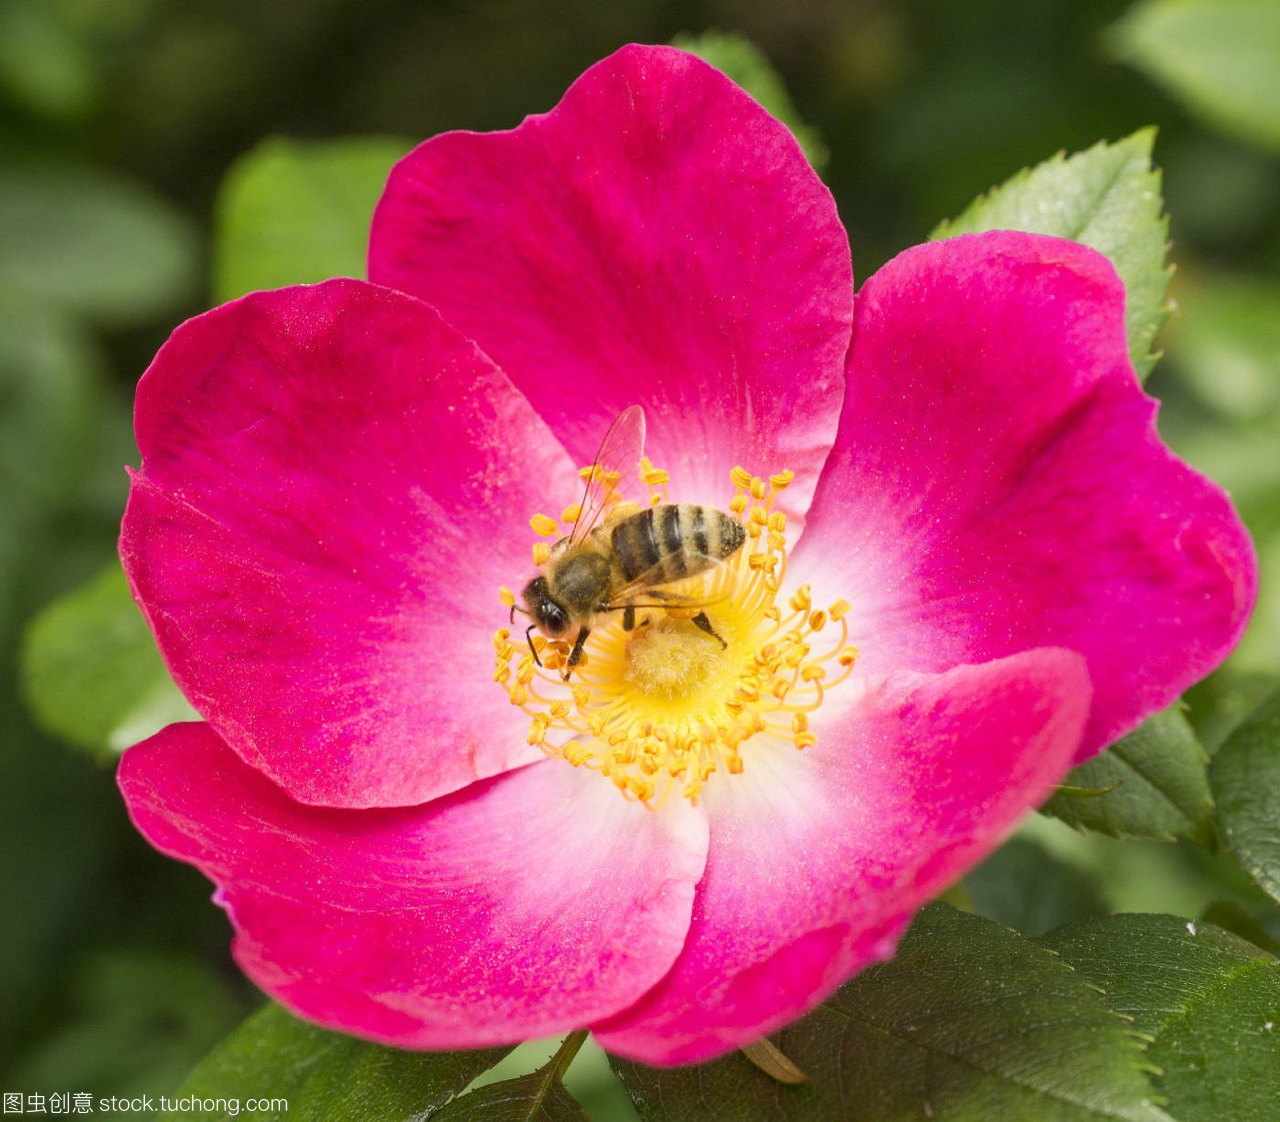 蜂,bumblebee,开花,Bloom,盛开,blossom,茂盛,ark.蜗牛.com图片